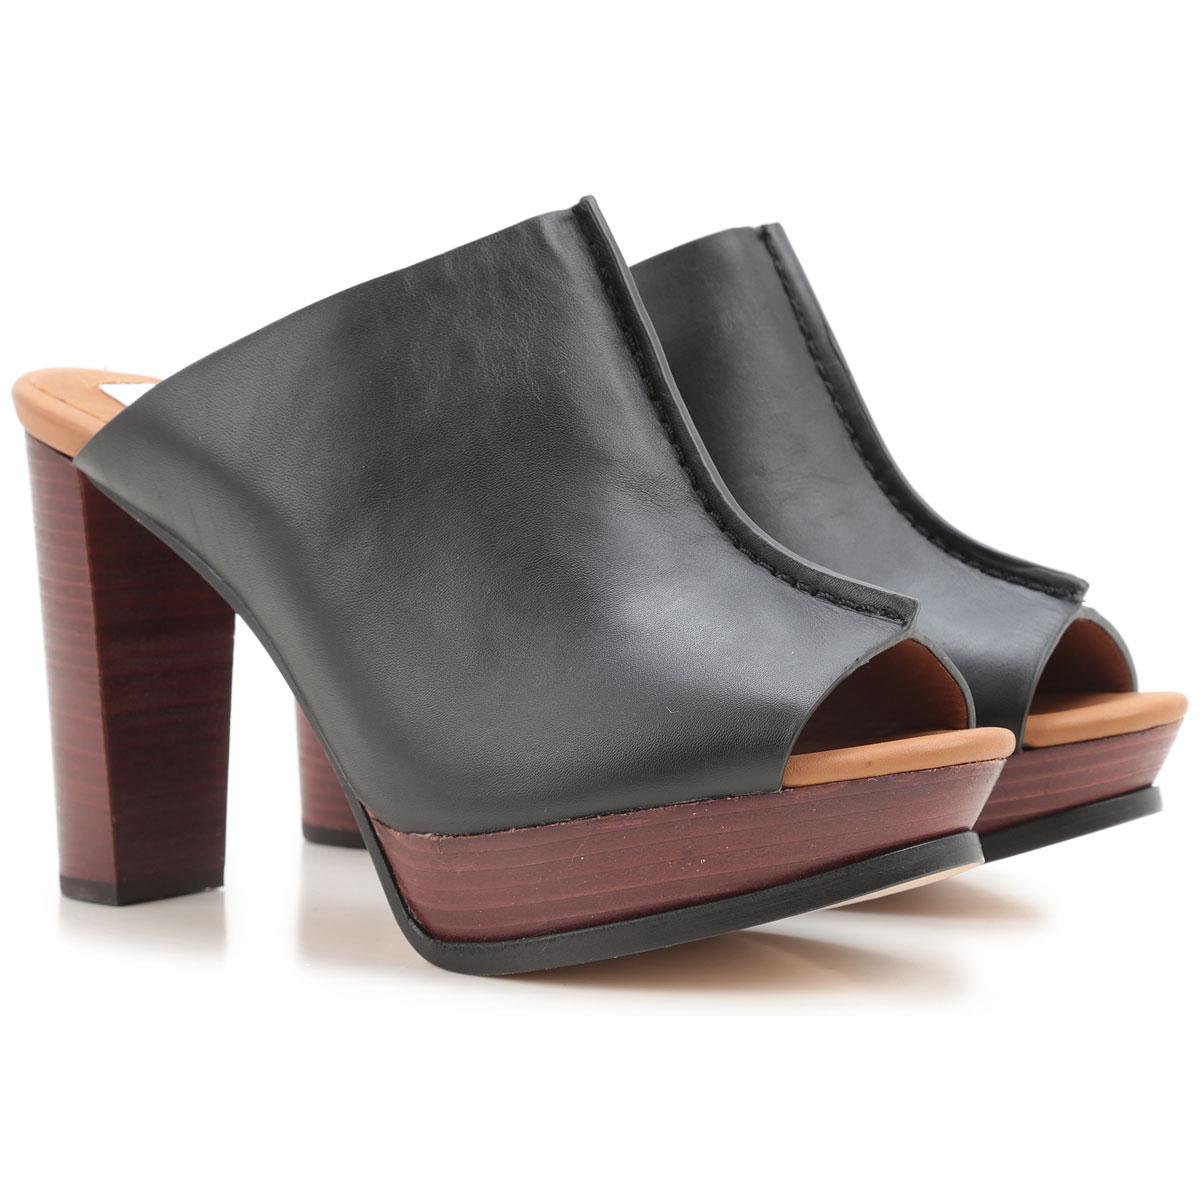 chaussures femme chlo code produit sb26210 3095 999. Black Bedroom Furniture Sets. Home Design Ideas